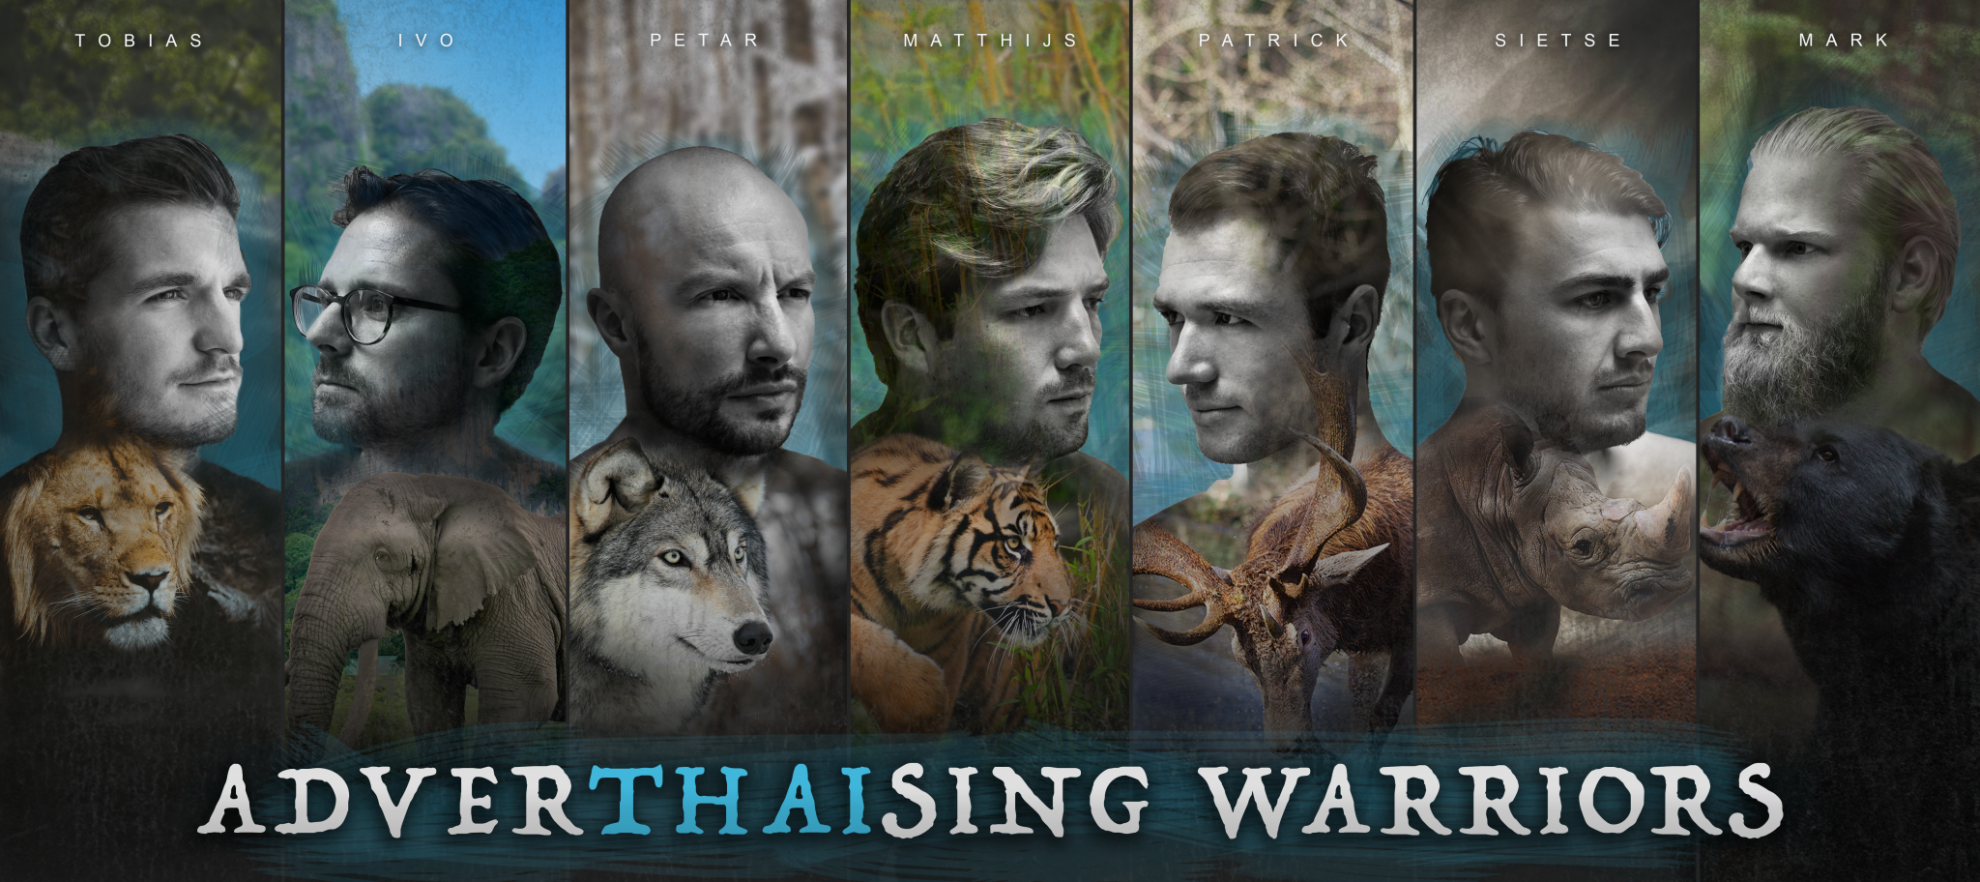 Advidi's Adverthaising Warriors